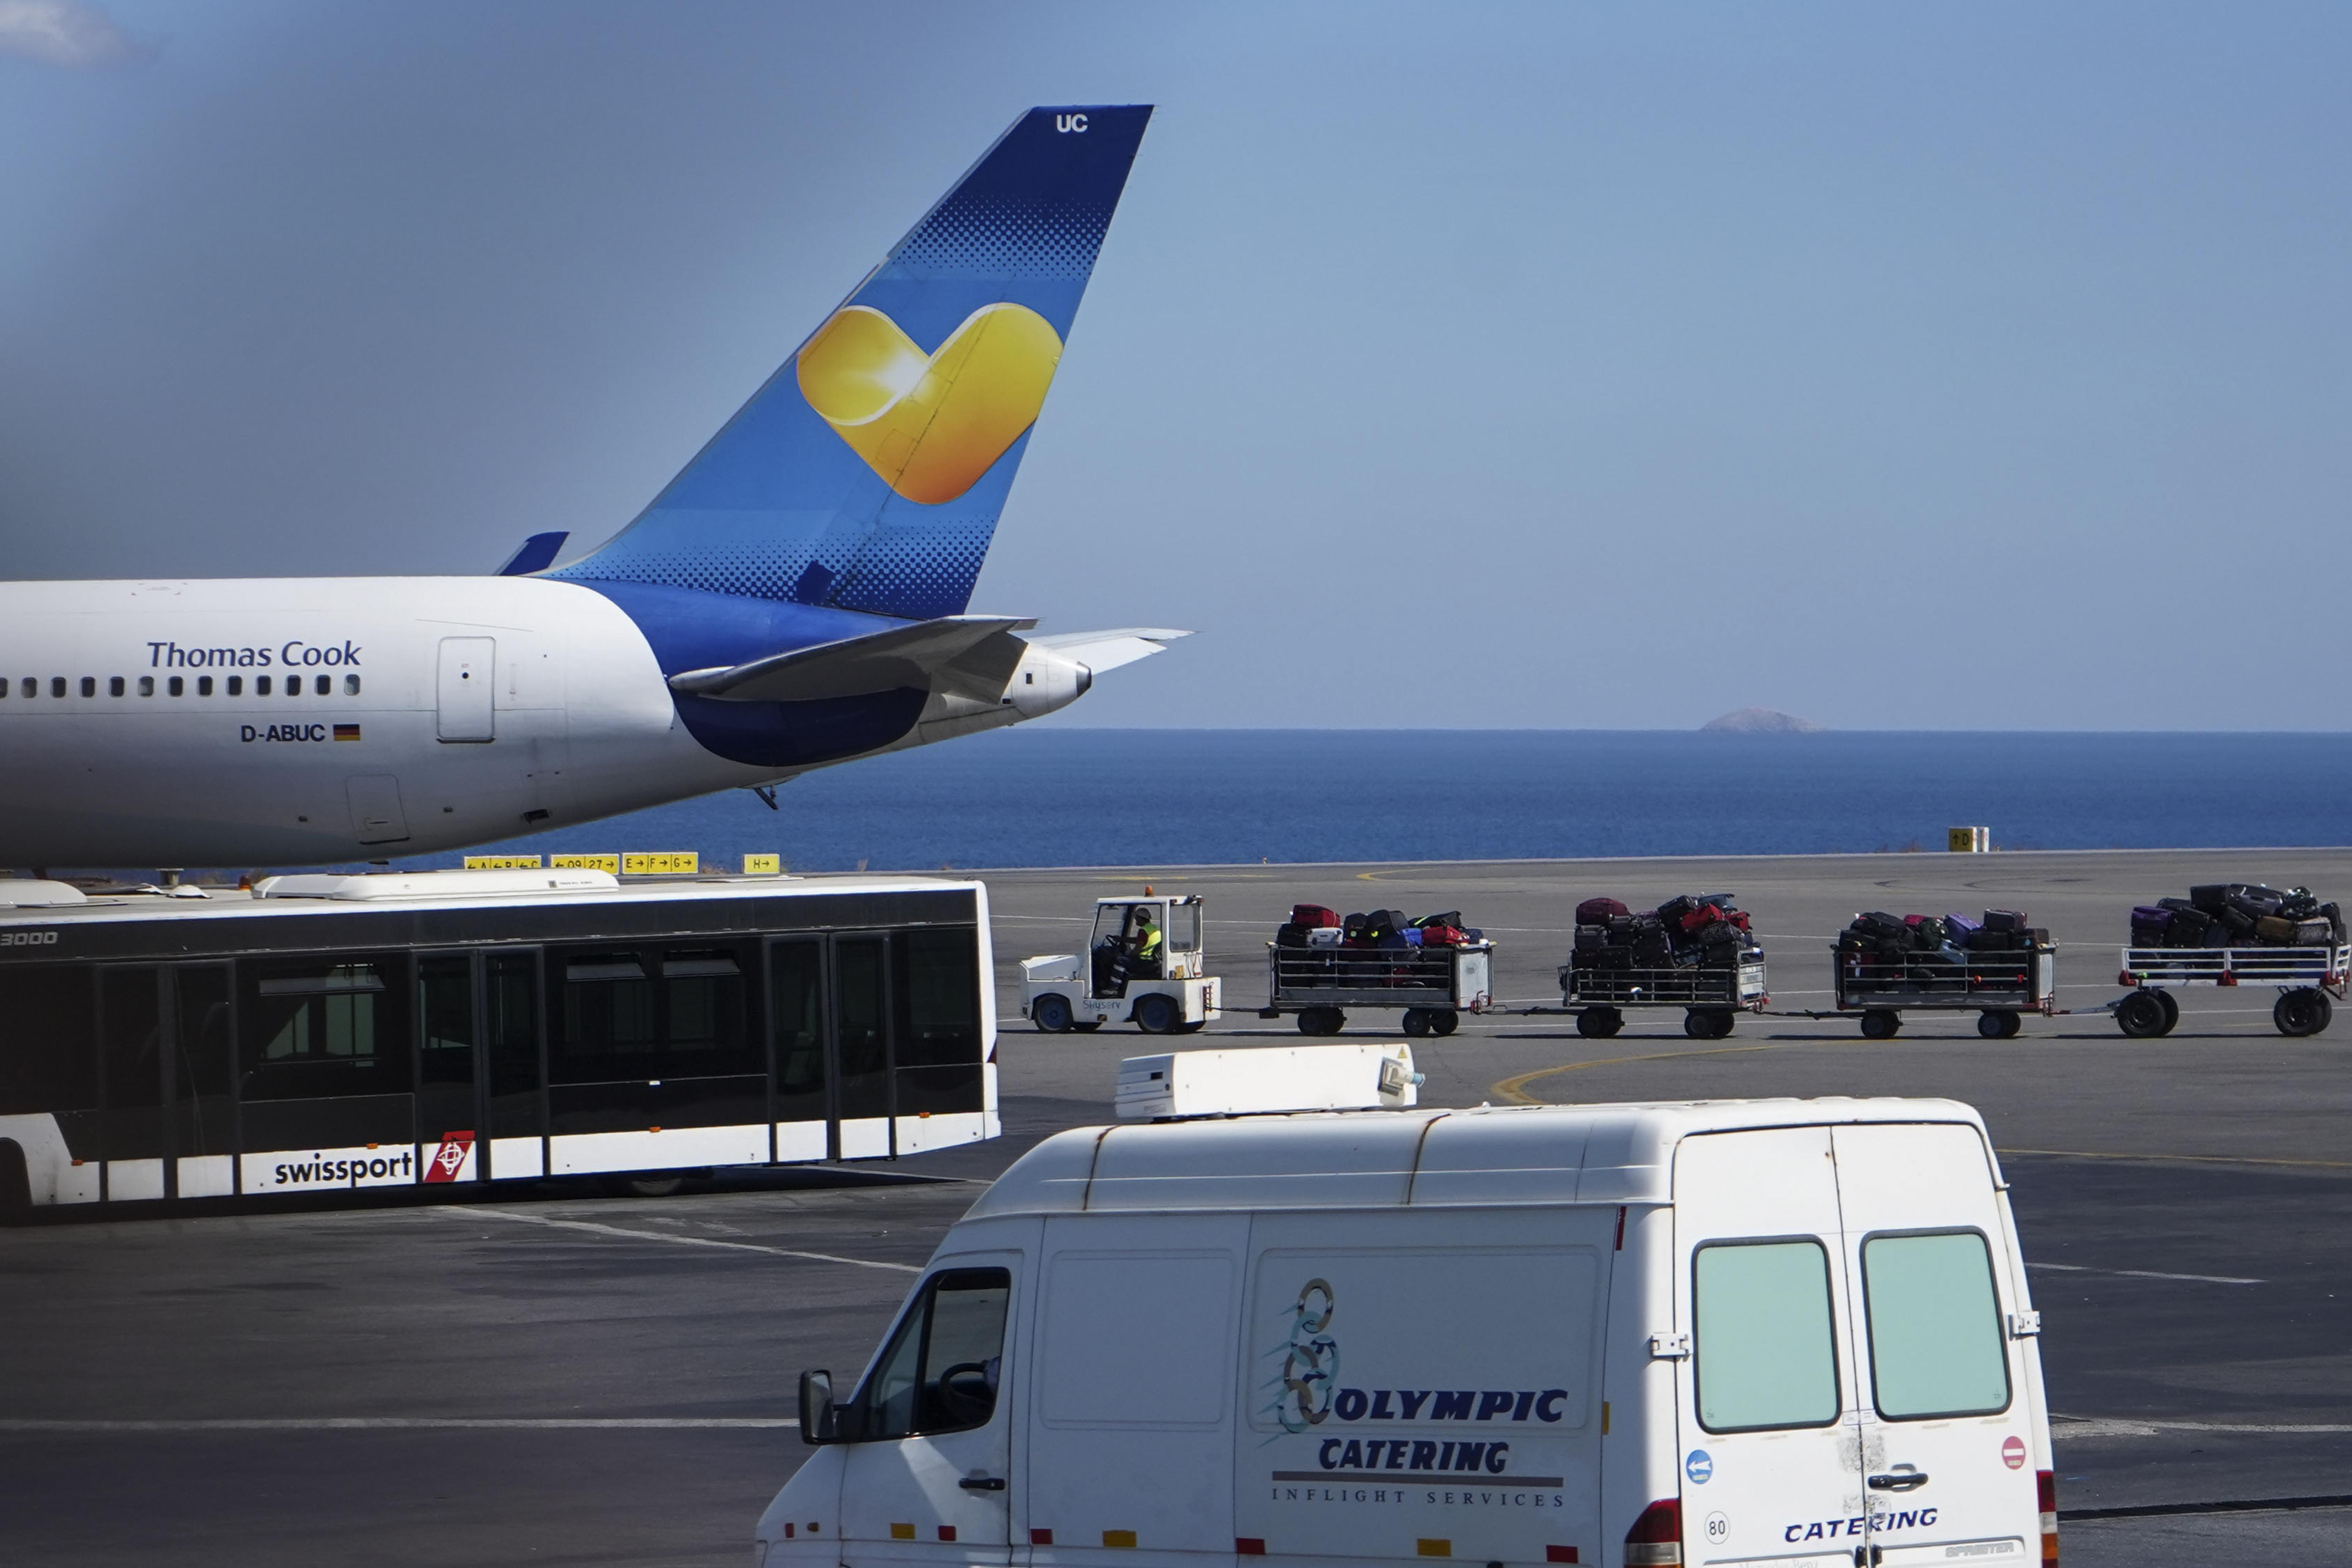 vliegveld onderzoek klimaatverandering Kreta